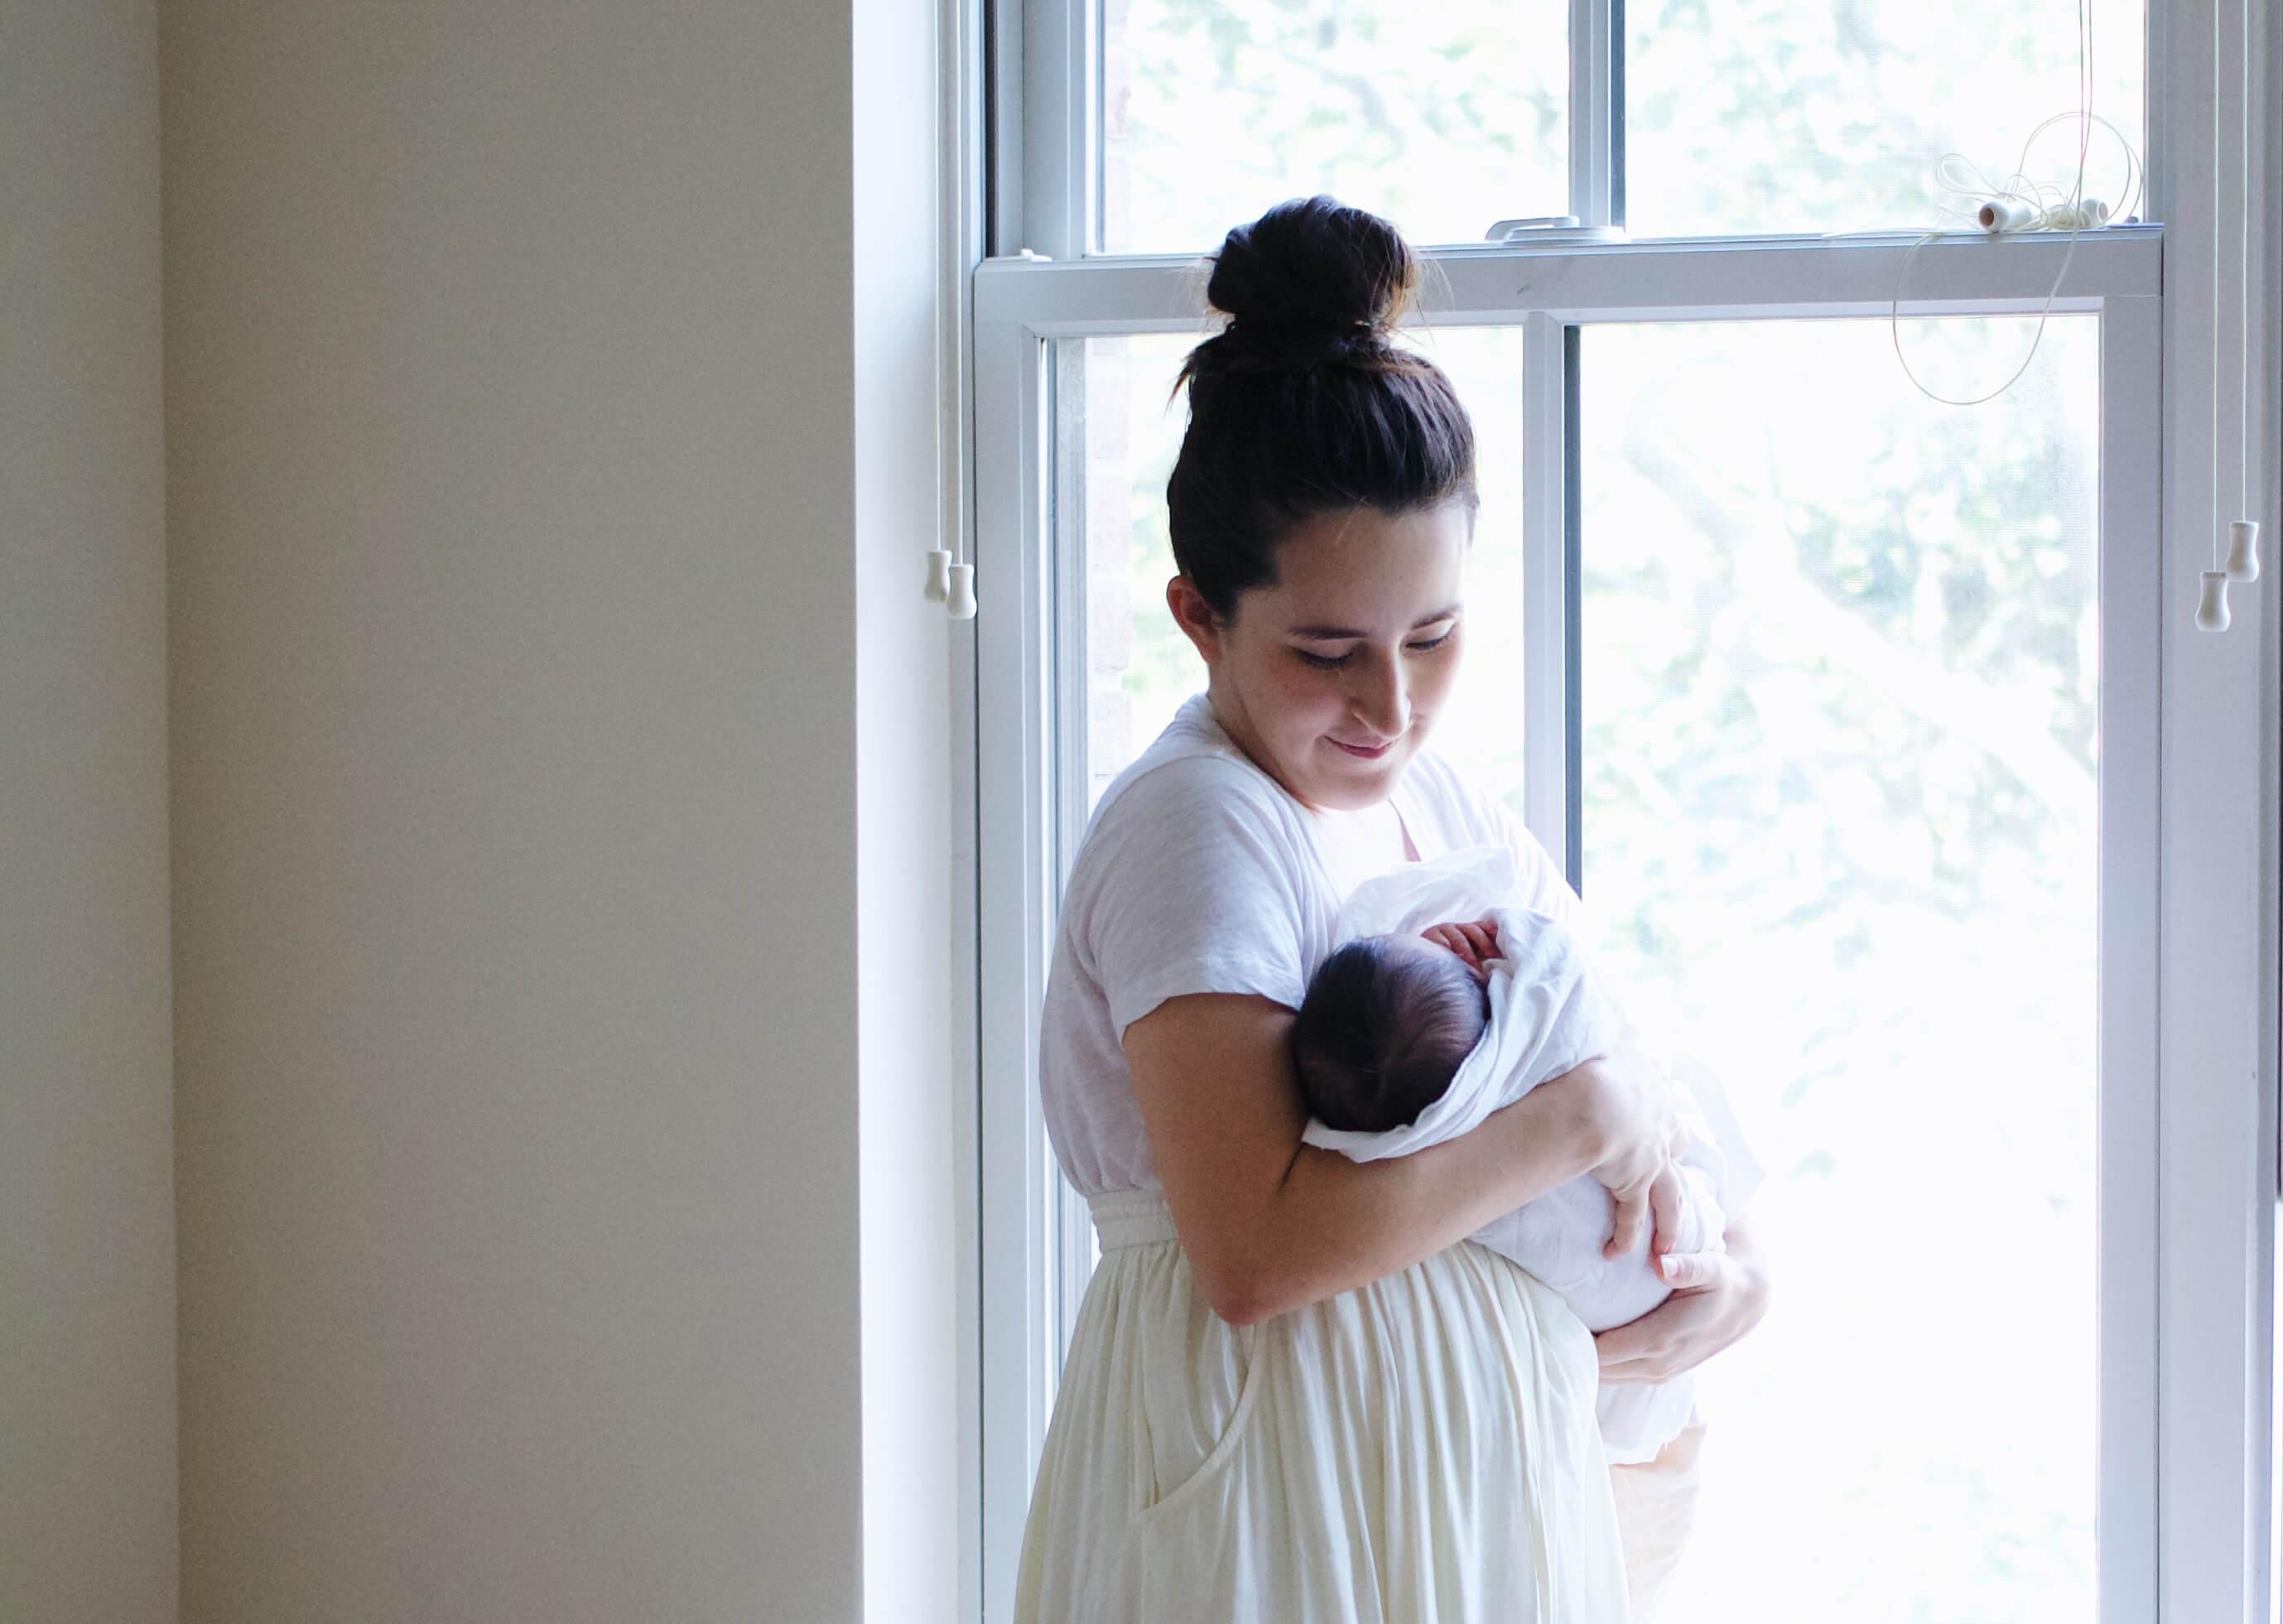 Madre con recien nacido